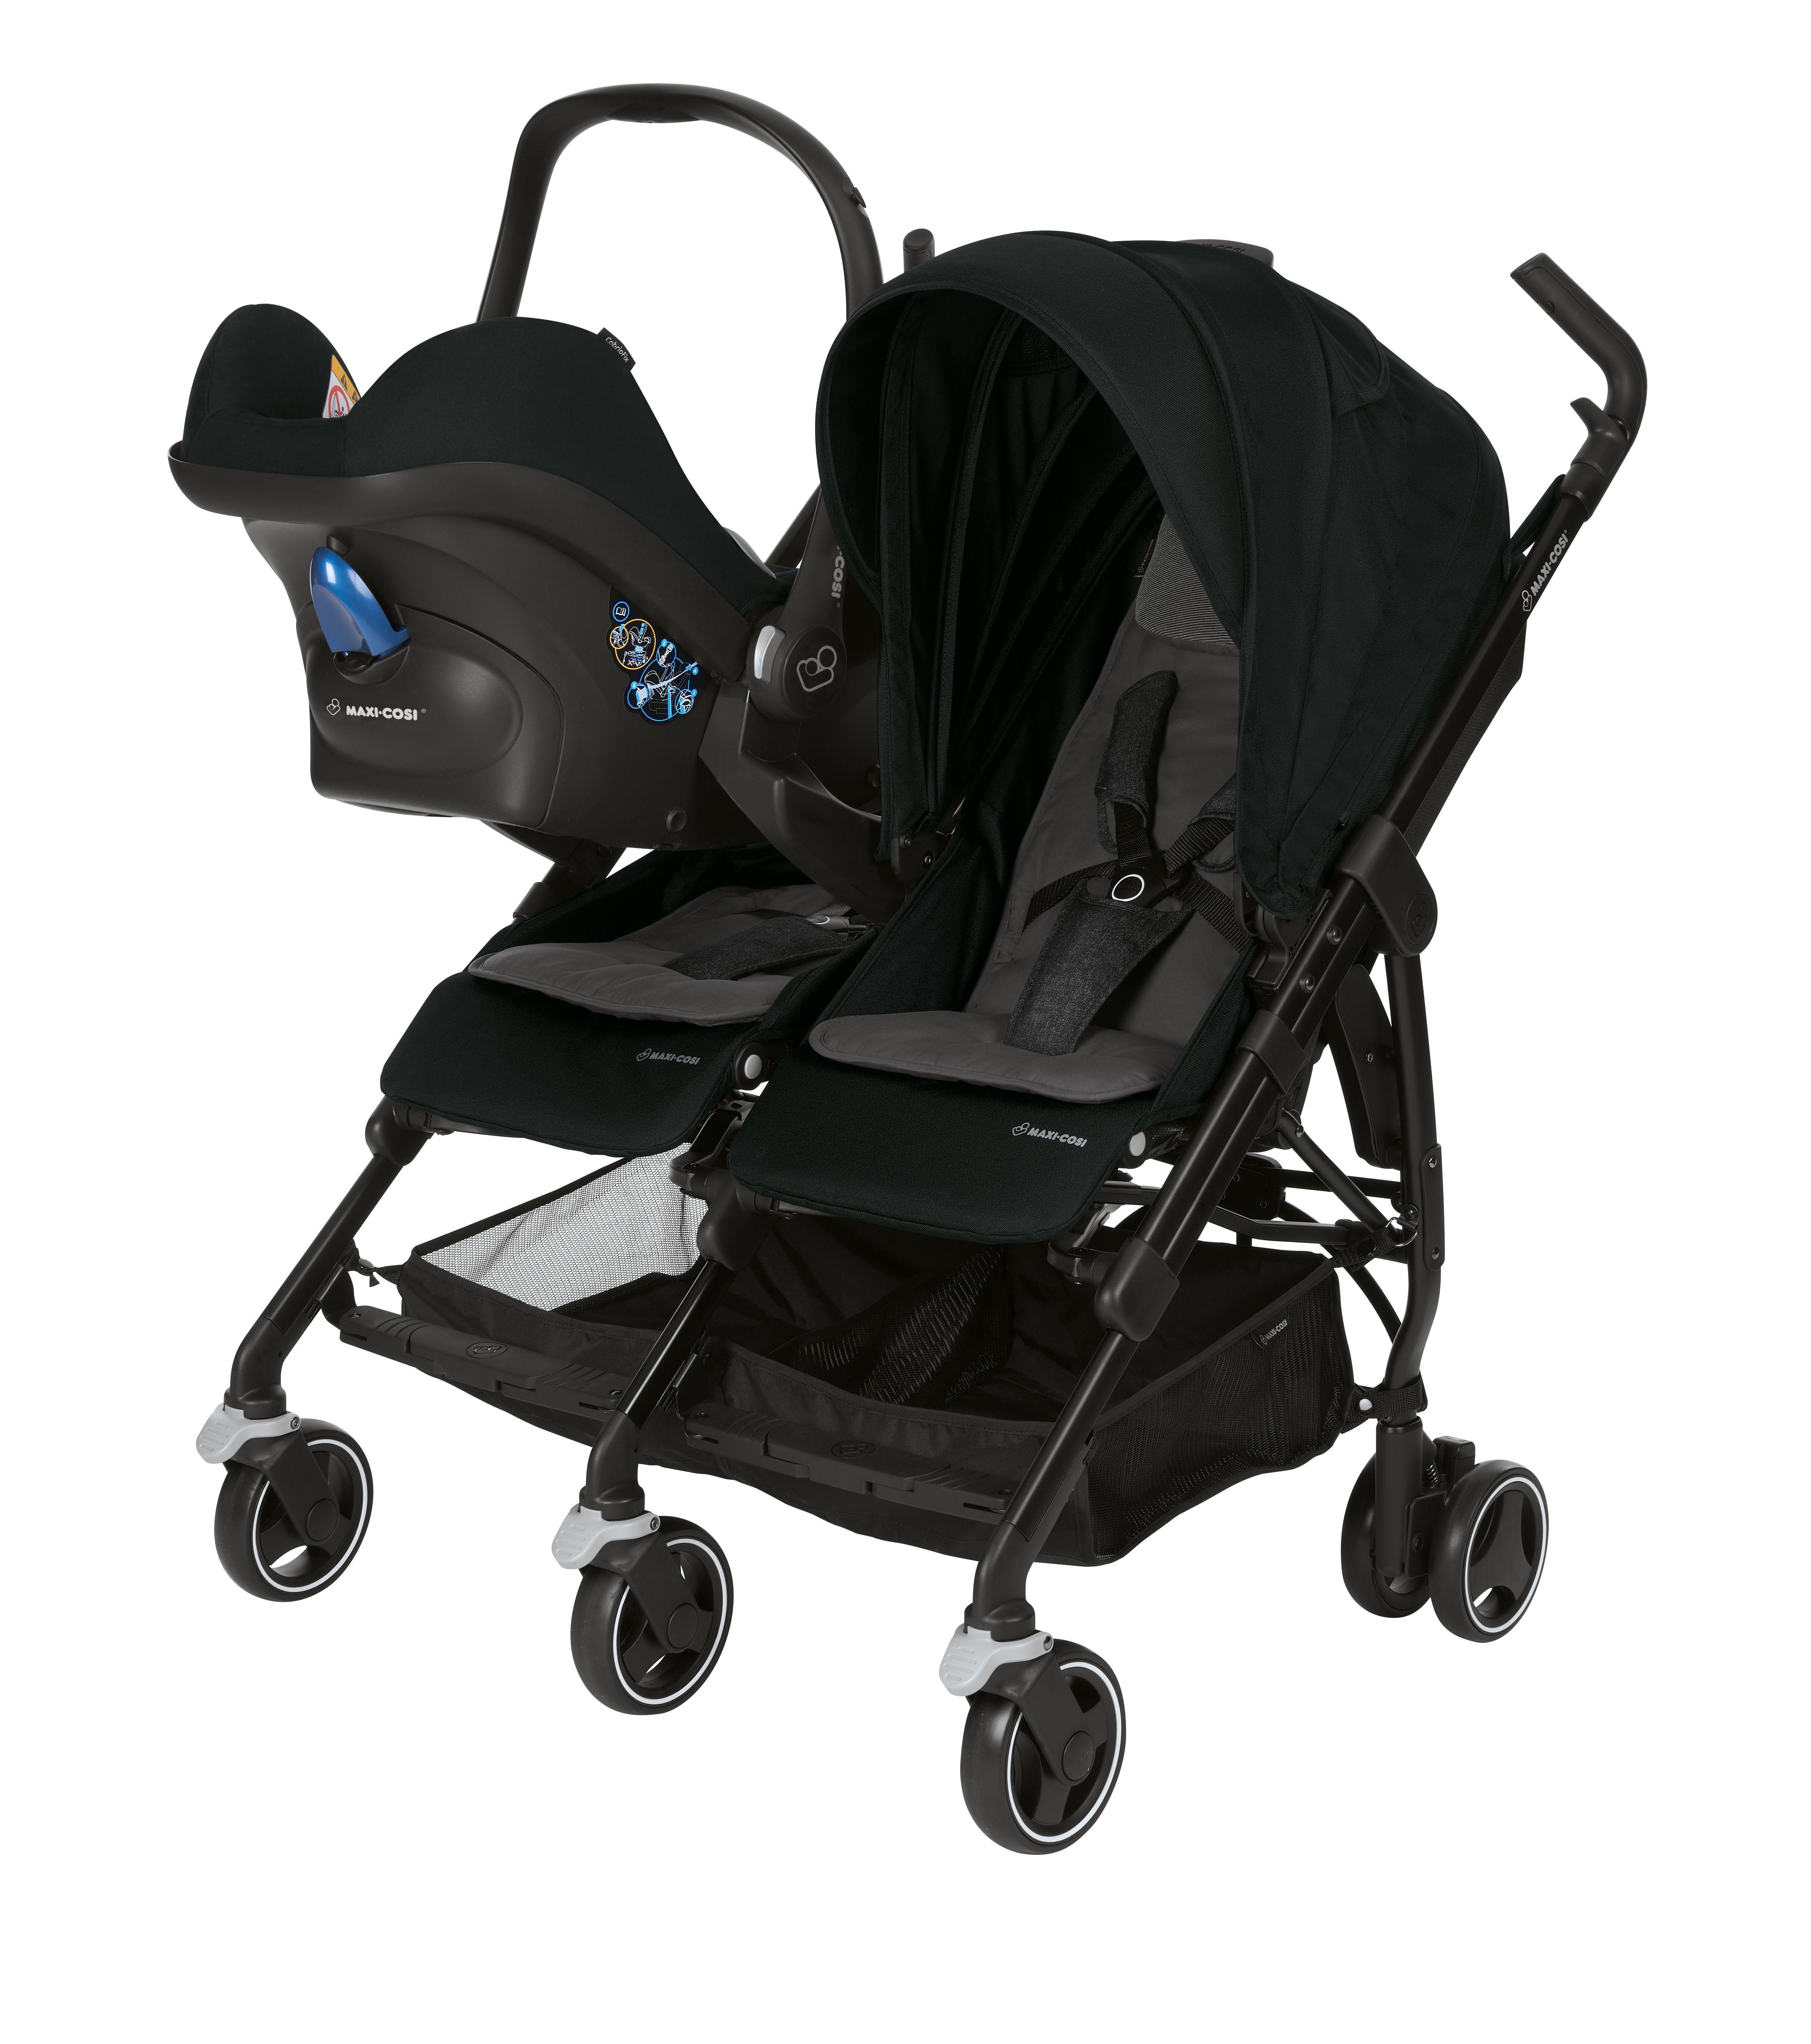 Zwillingskinderwagen maxi cosi  Maxi Cosi Buggy Dana For 2 2018 Nomad Black online kaufen bei ...